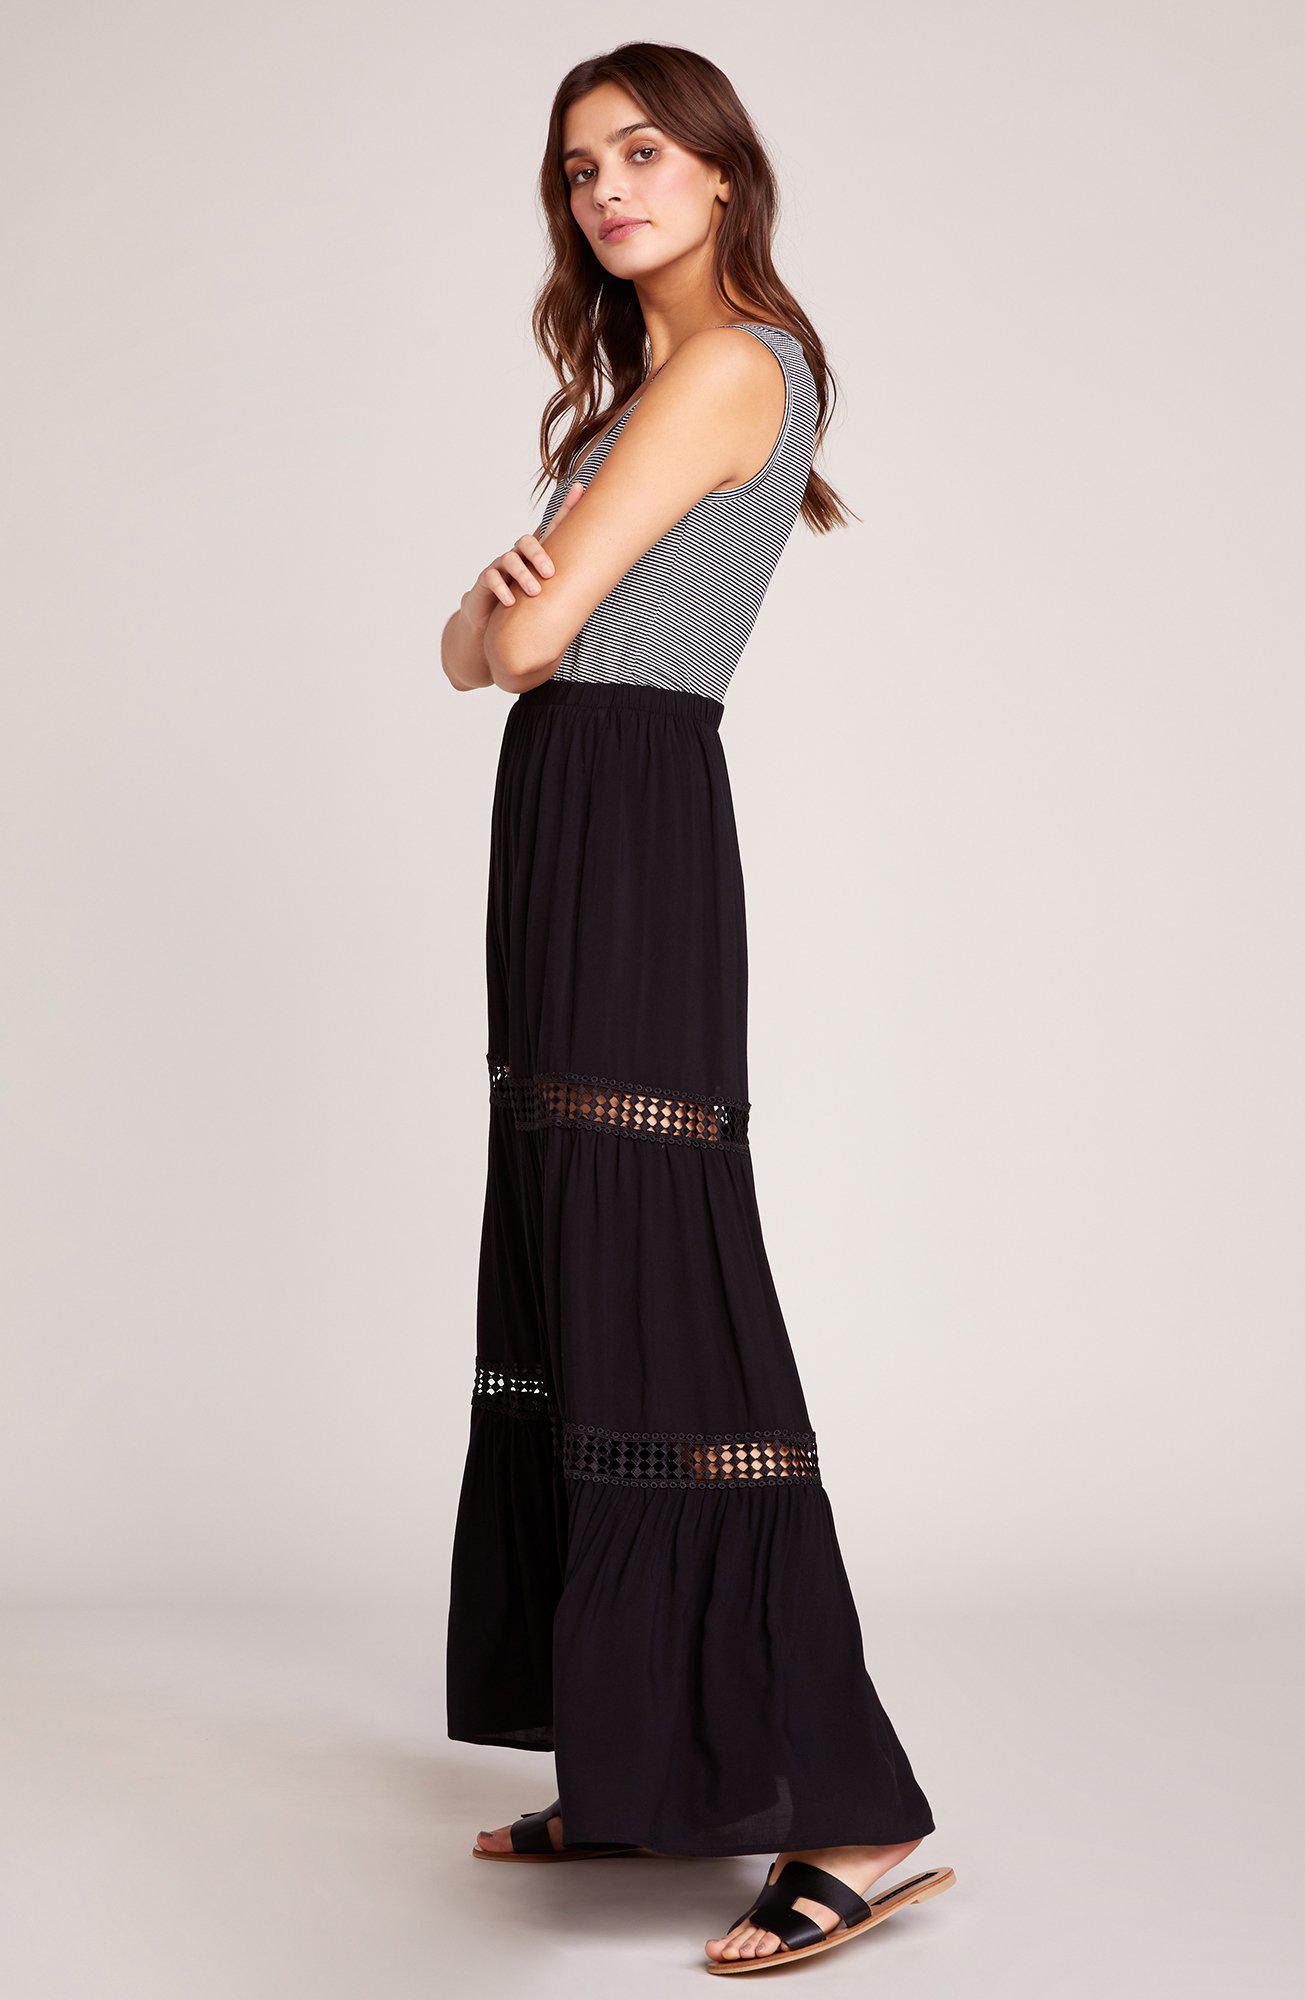 68126b6e7951a1 Black And Brown Maxi Skirt